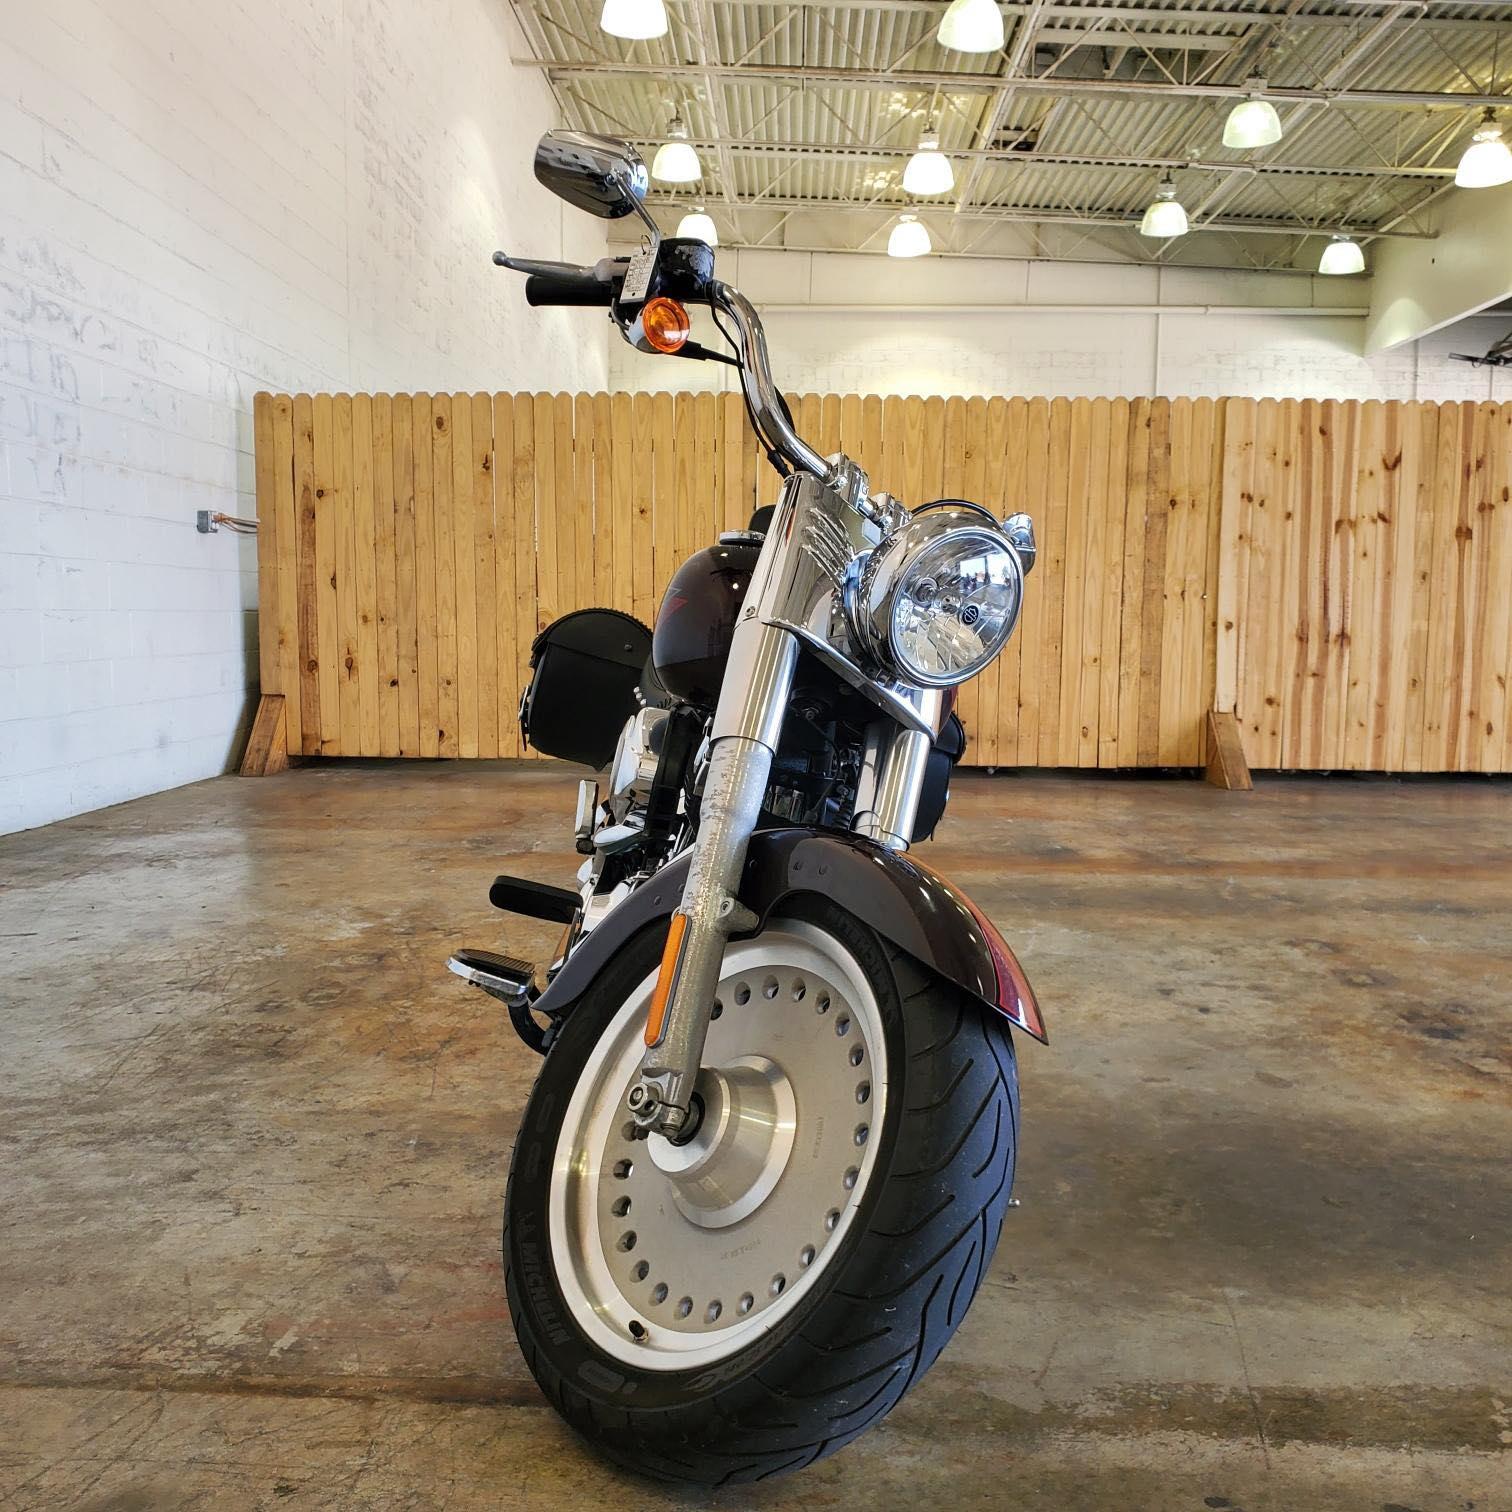 2007 Harley-Davidson Softail Fat Boy at Twisted Cycles